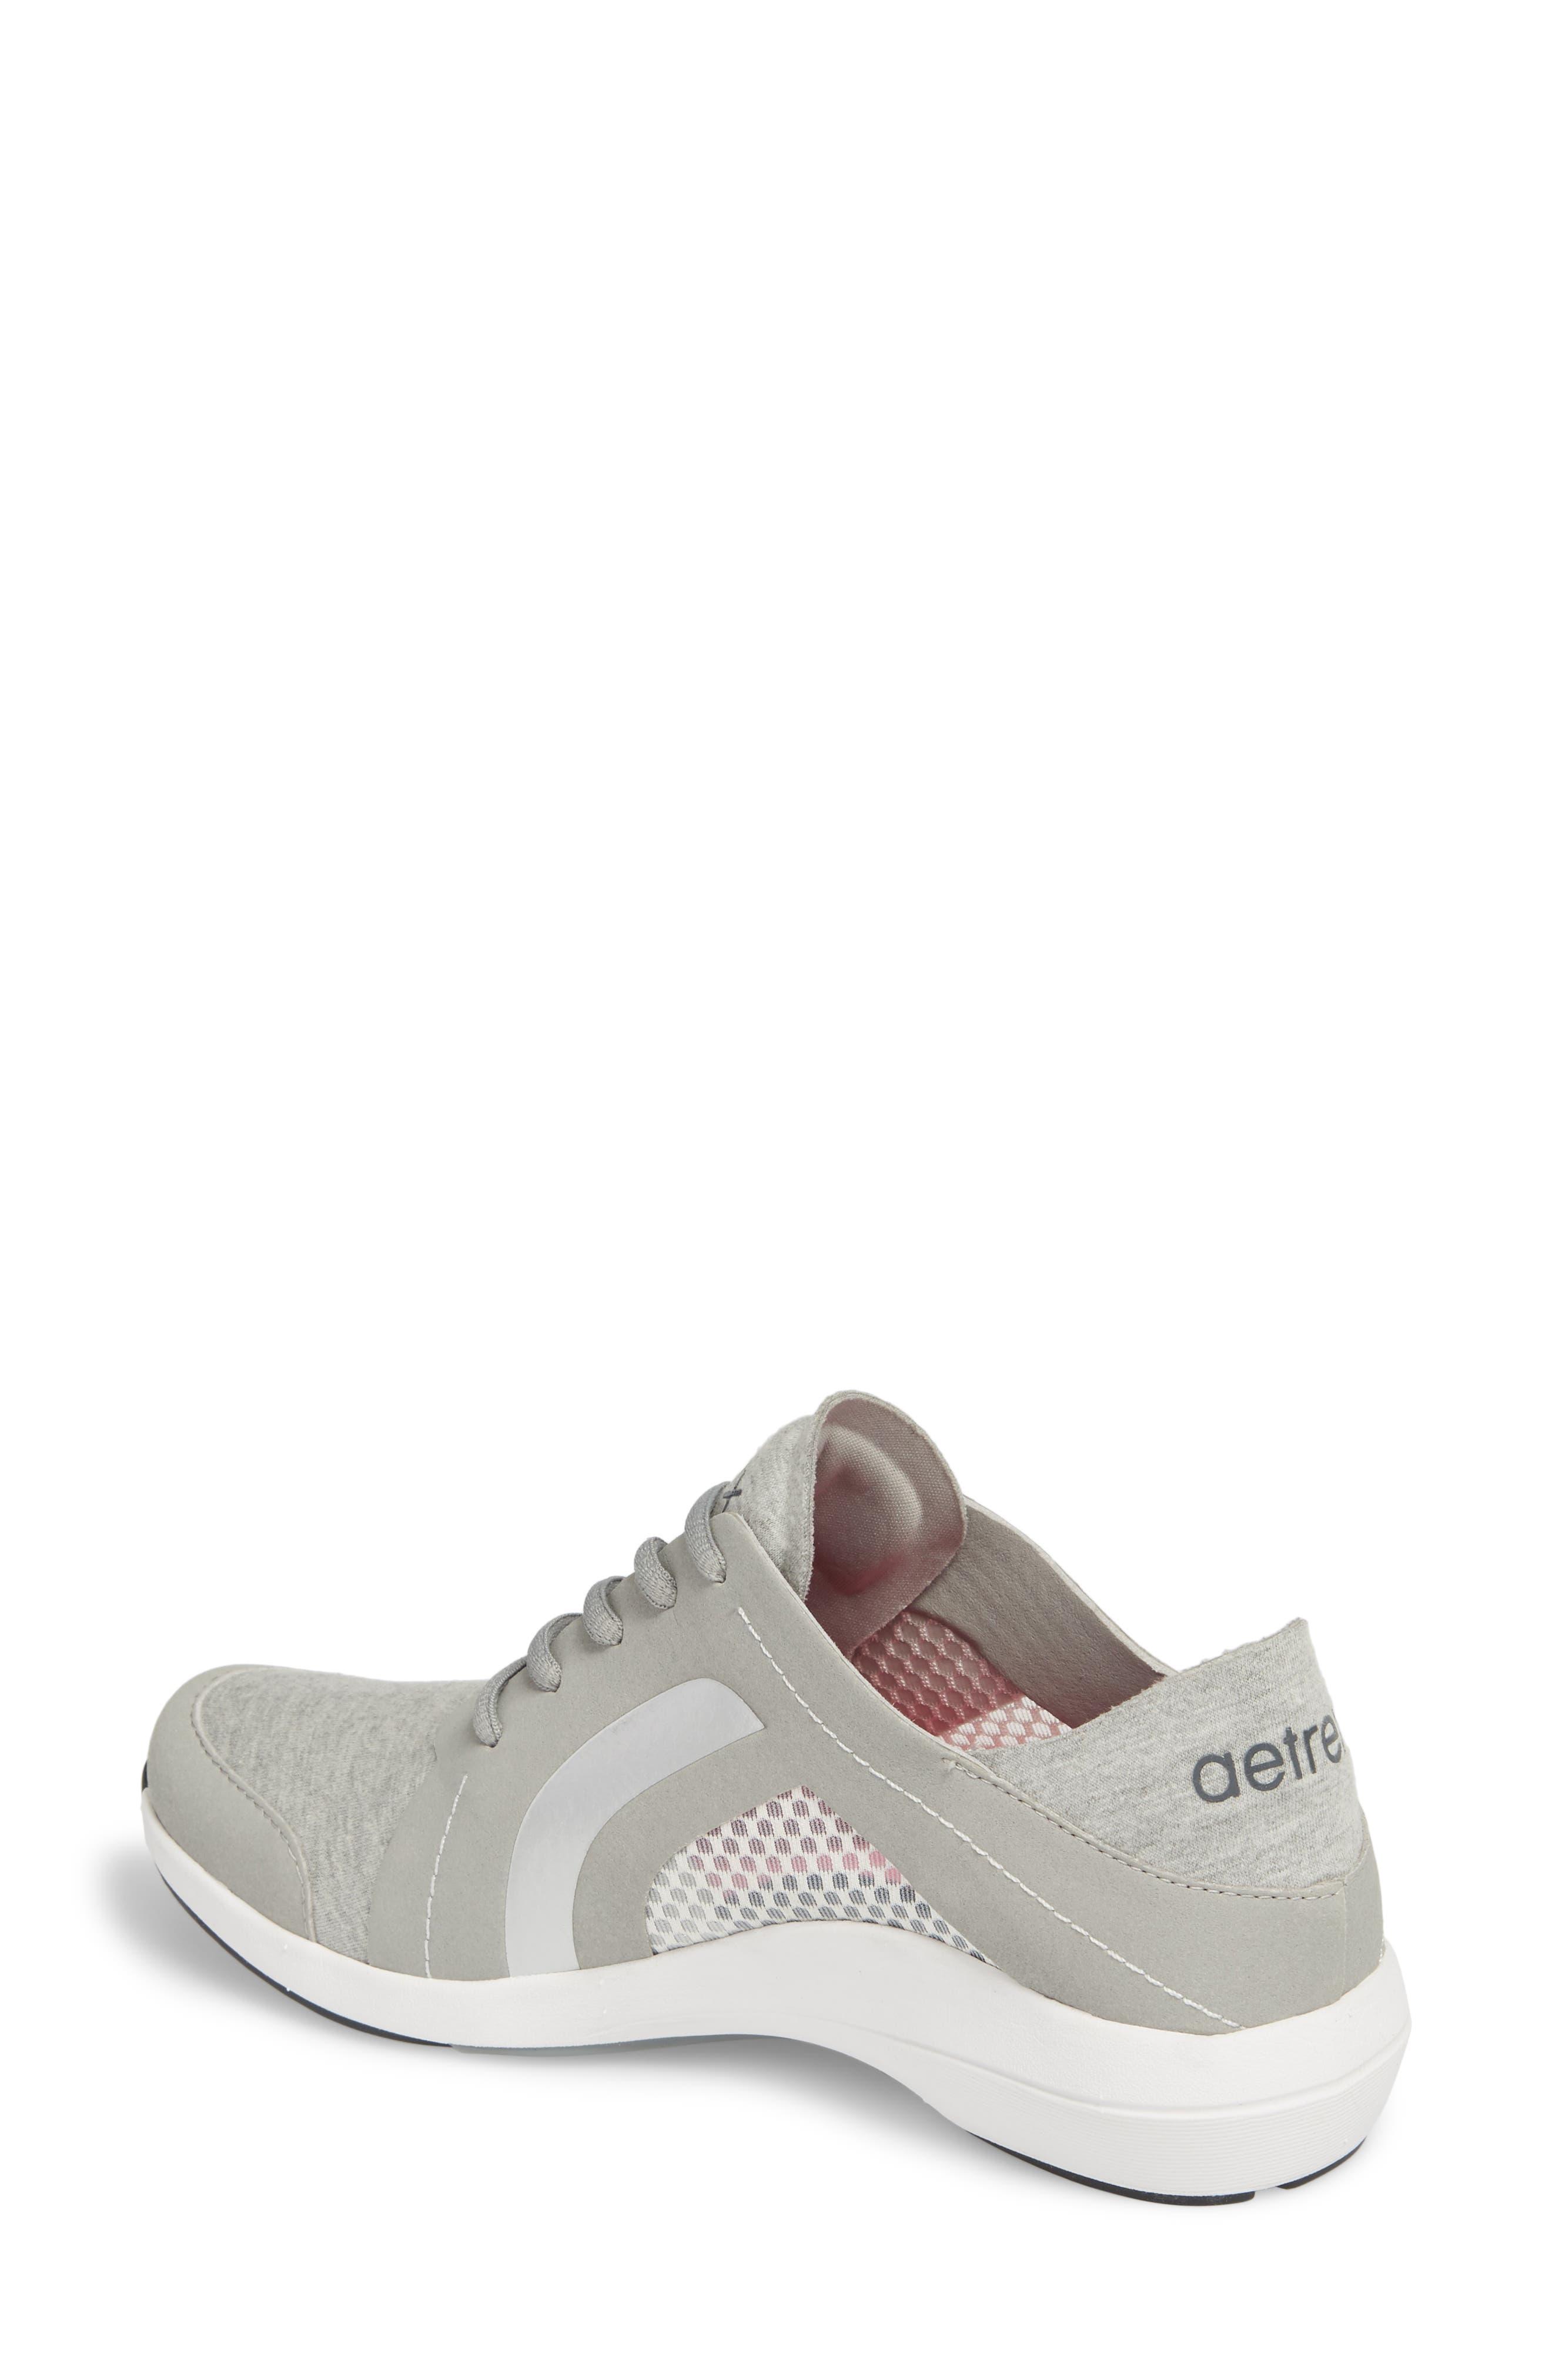 Sloane Sneaker,                             Alternate thumbnail 2, color,                             Grey Fabric